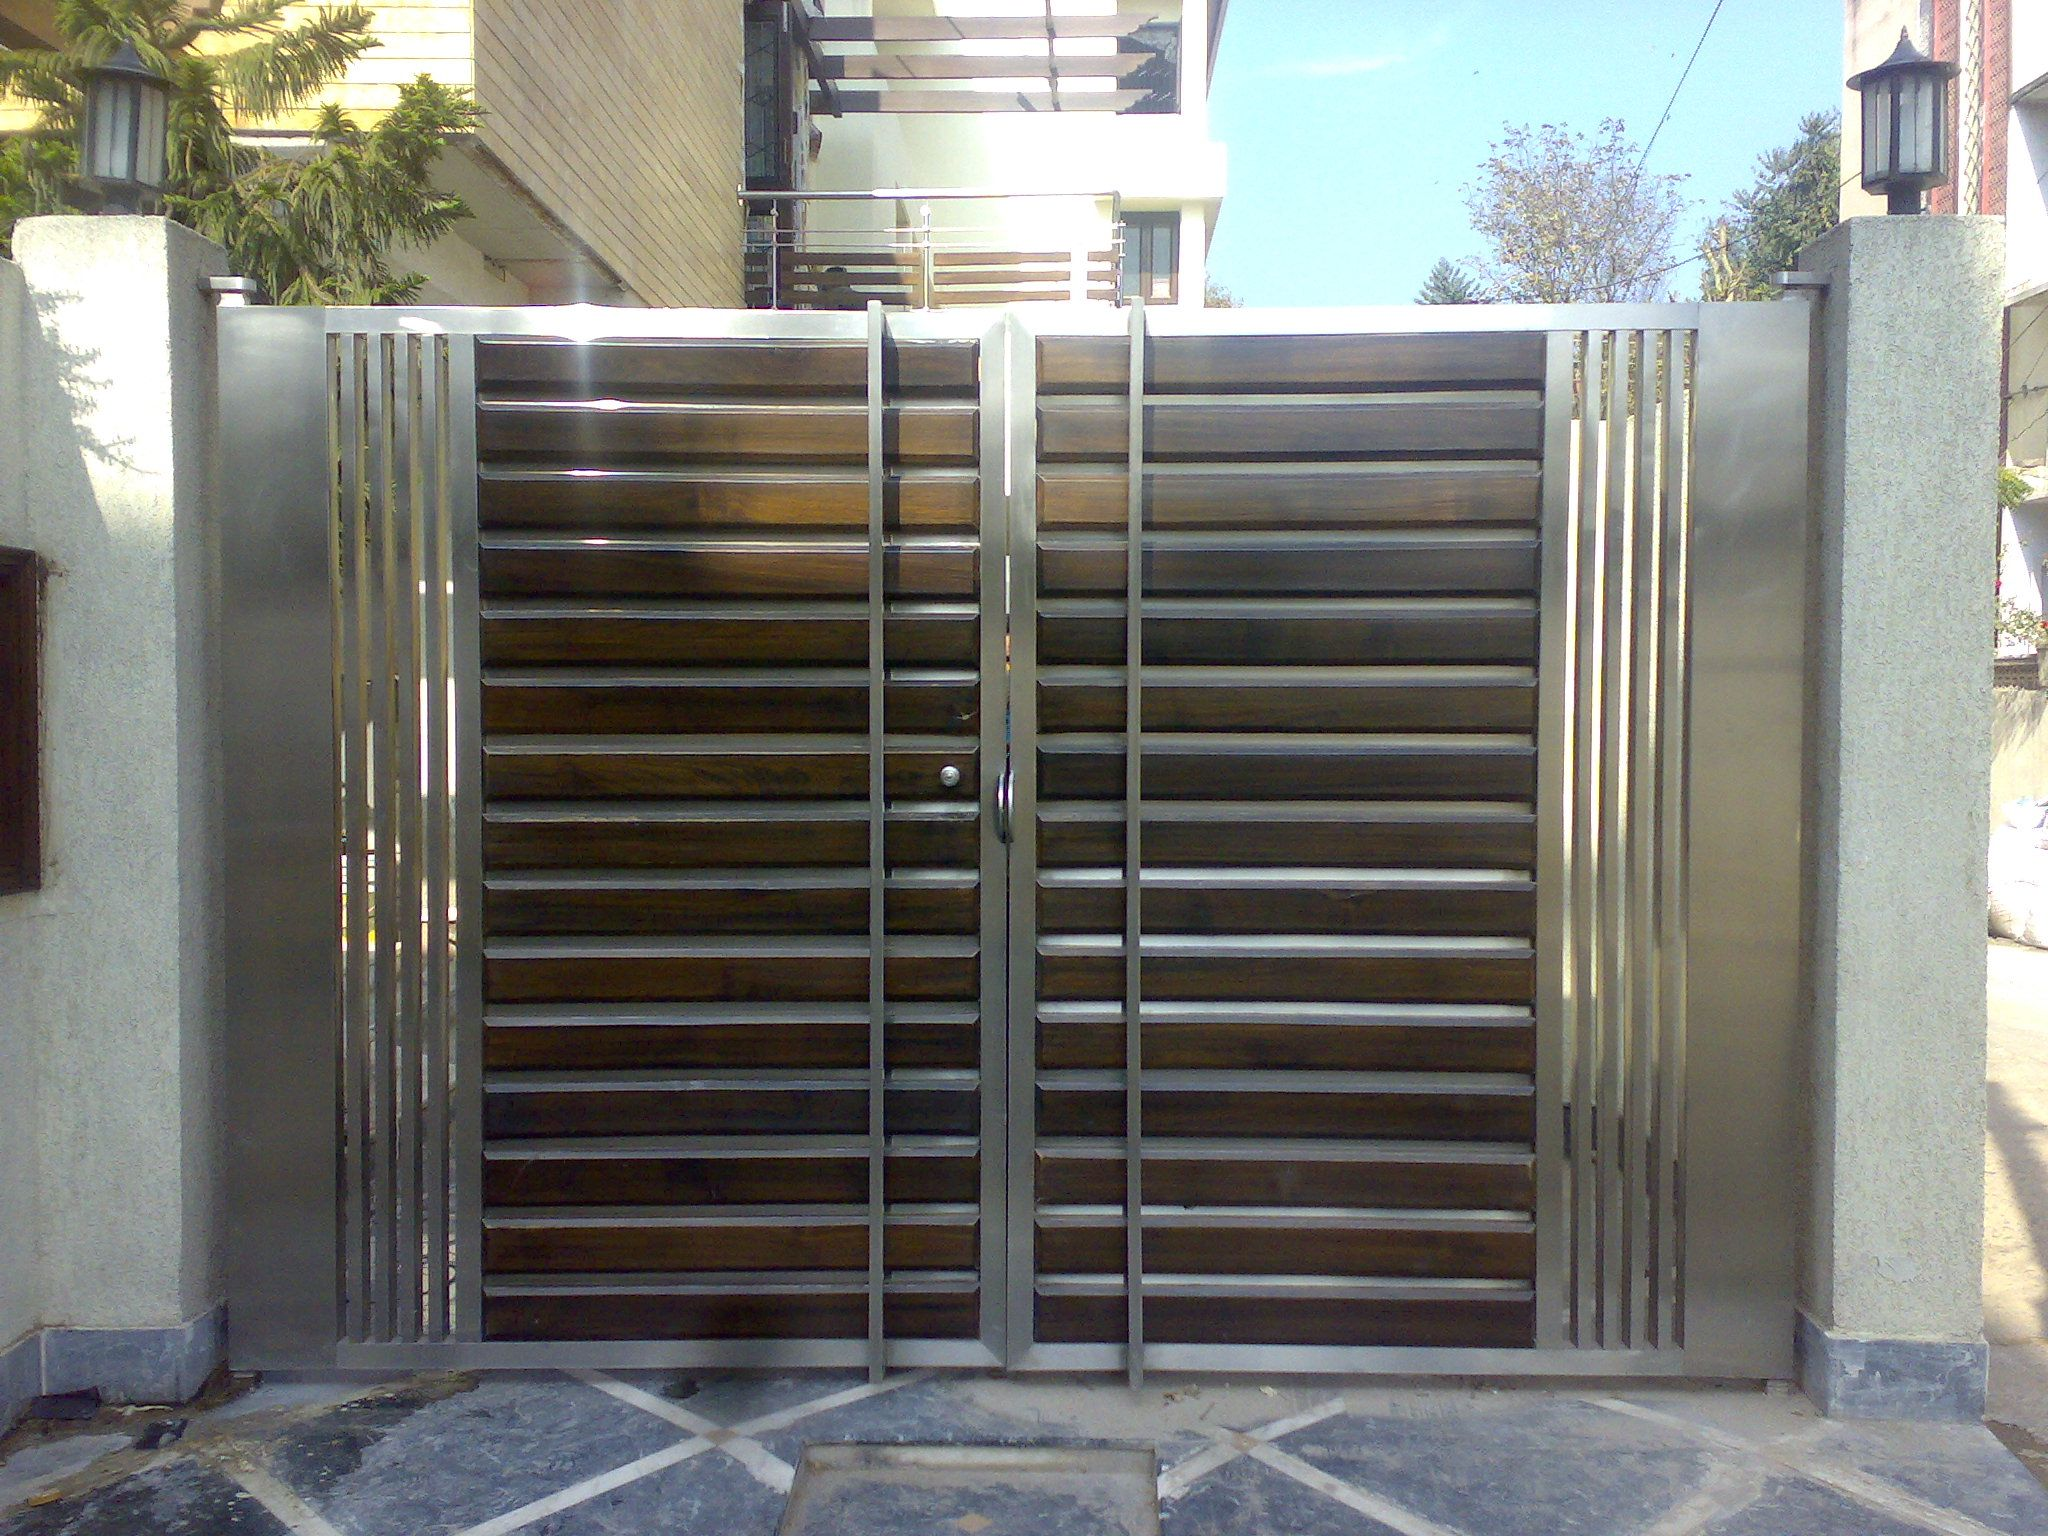 Compund walls and gate pinterest google gate design and gates - Steel Gates Stainless Steel Gates Gate